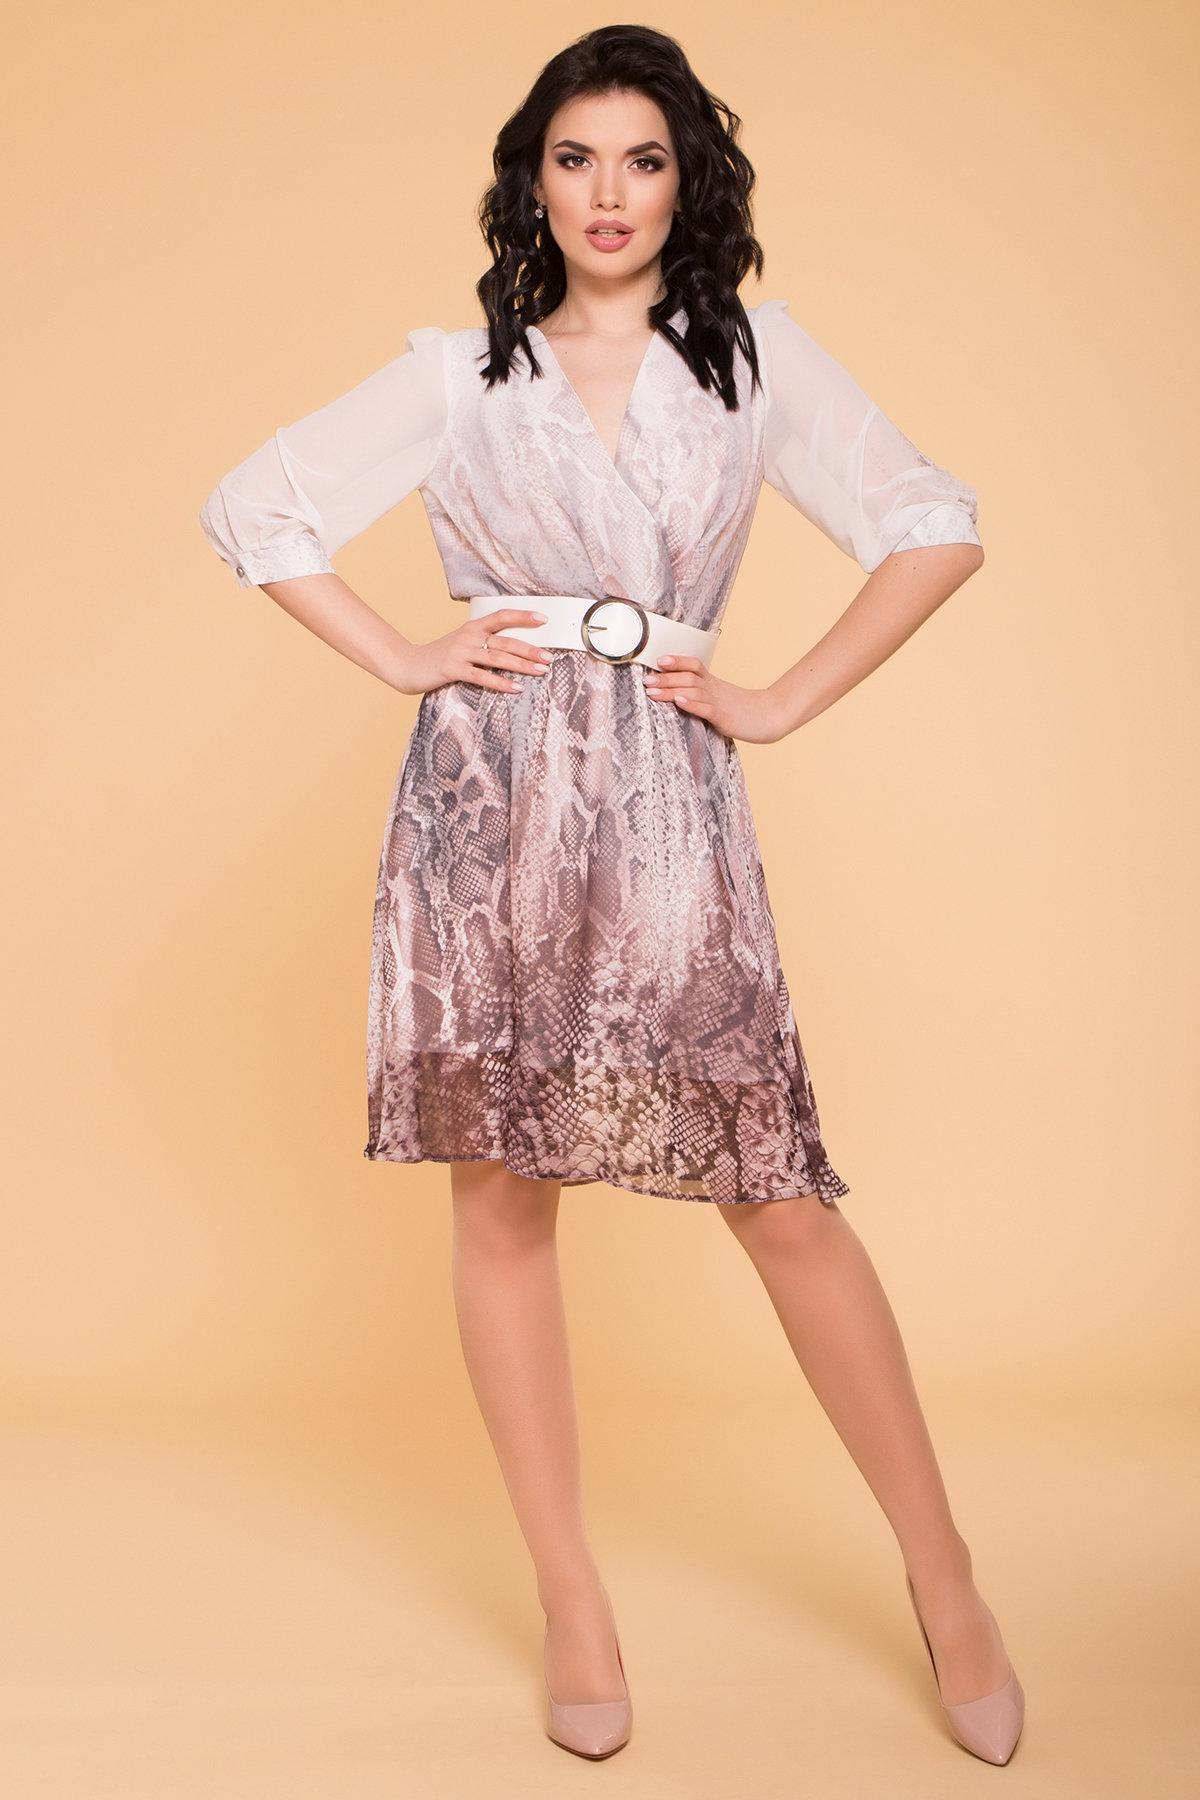 Платье Солар 6522 Цвет: Леоп купон мол/пудр/мол